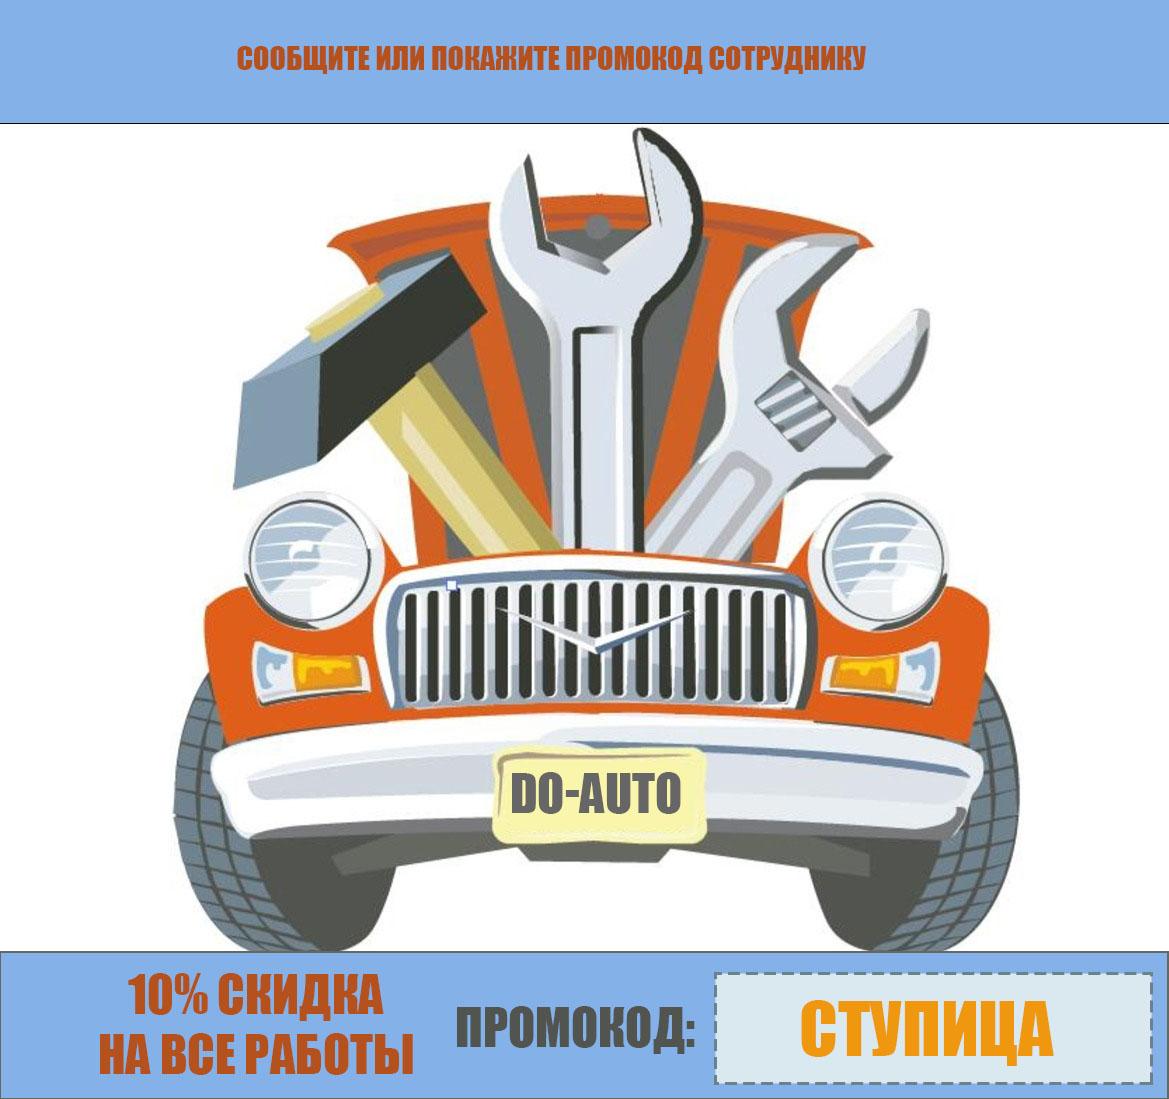 Промокод do-auto